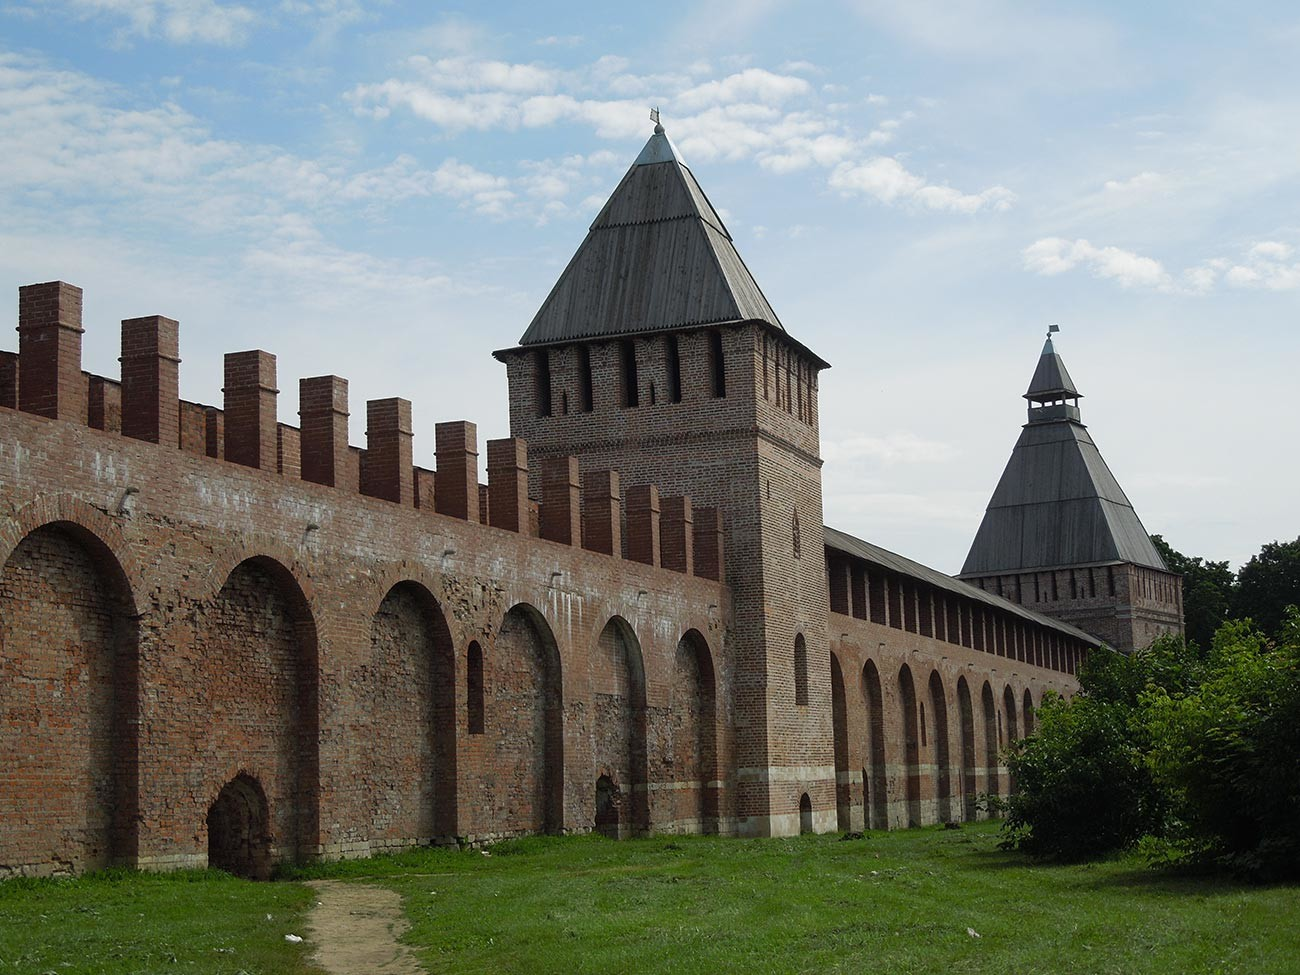 The Smolensk Citadel